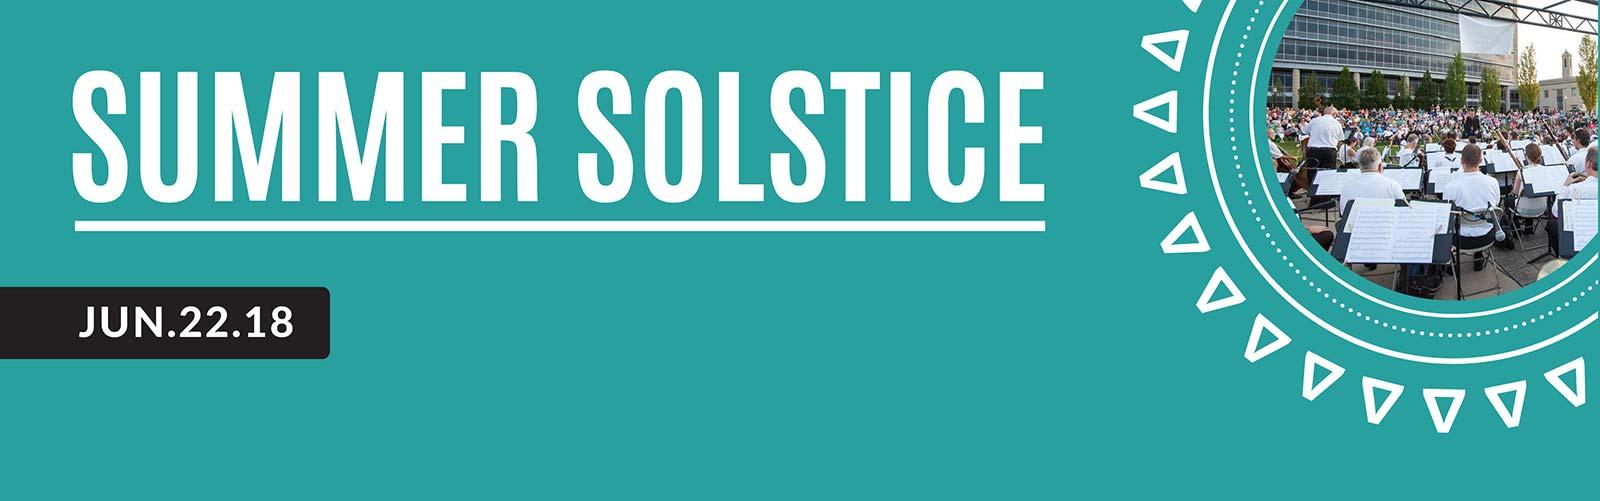 summer-solstice-home-banner